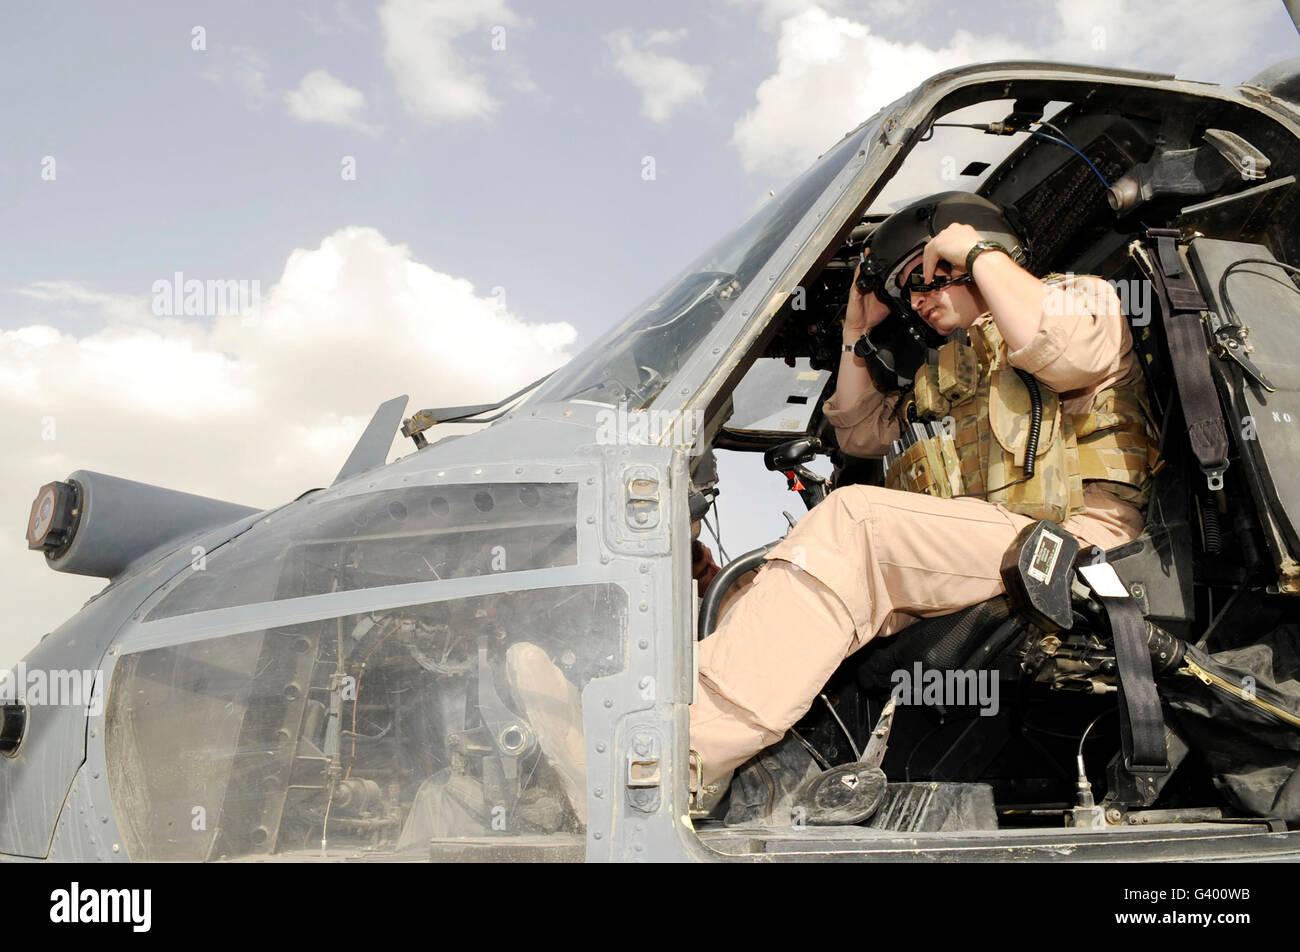 A pilot conducts preflight checks inside of a HH-60G Pave Hawk. - Stock Image